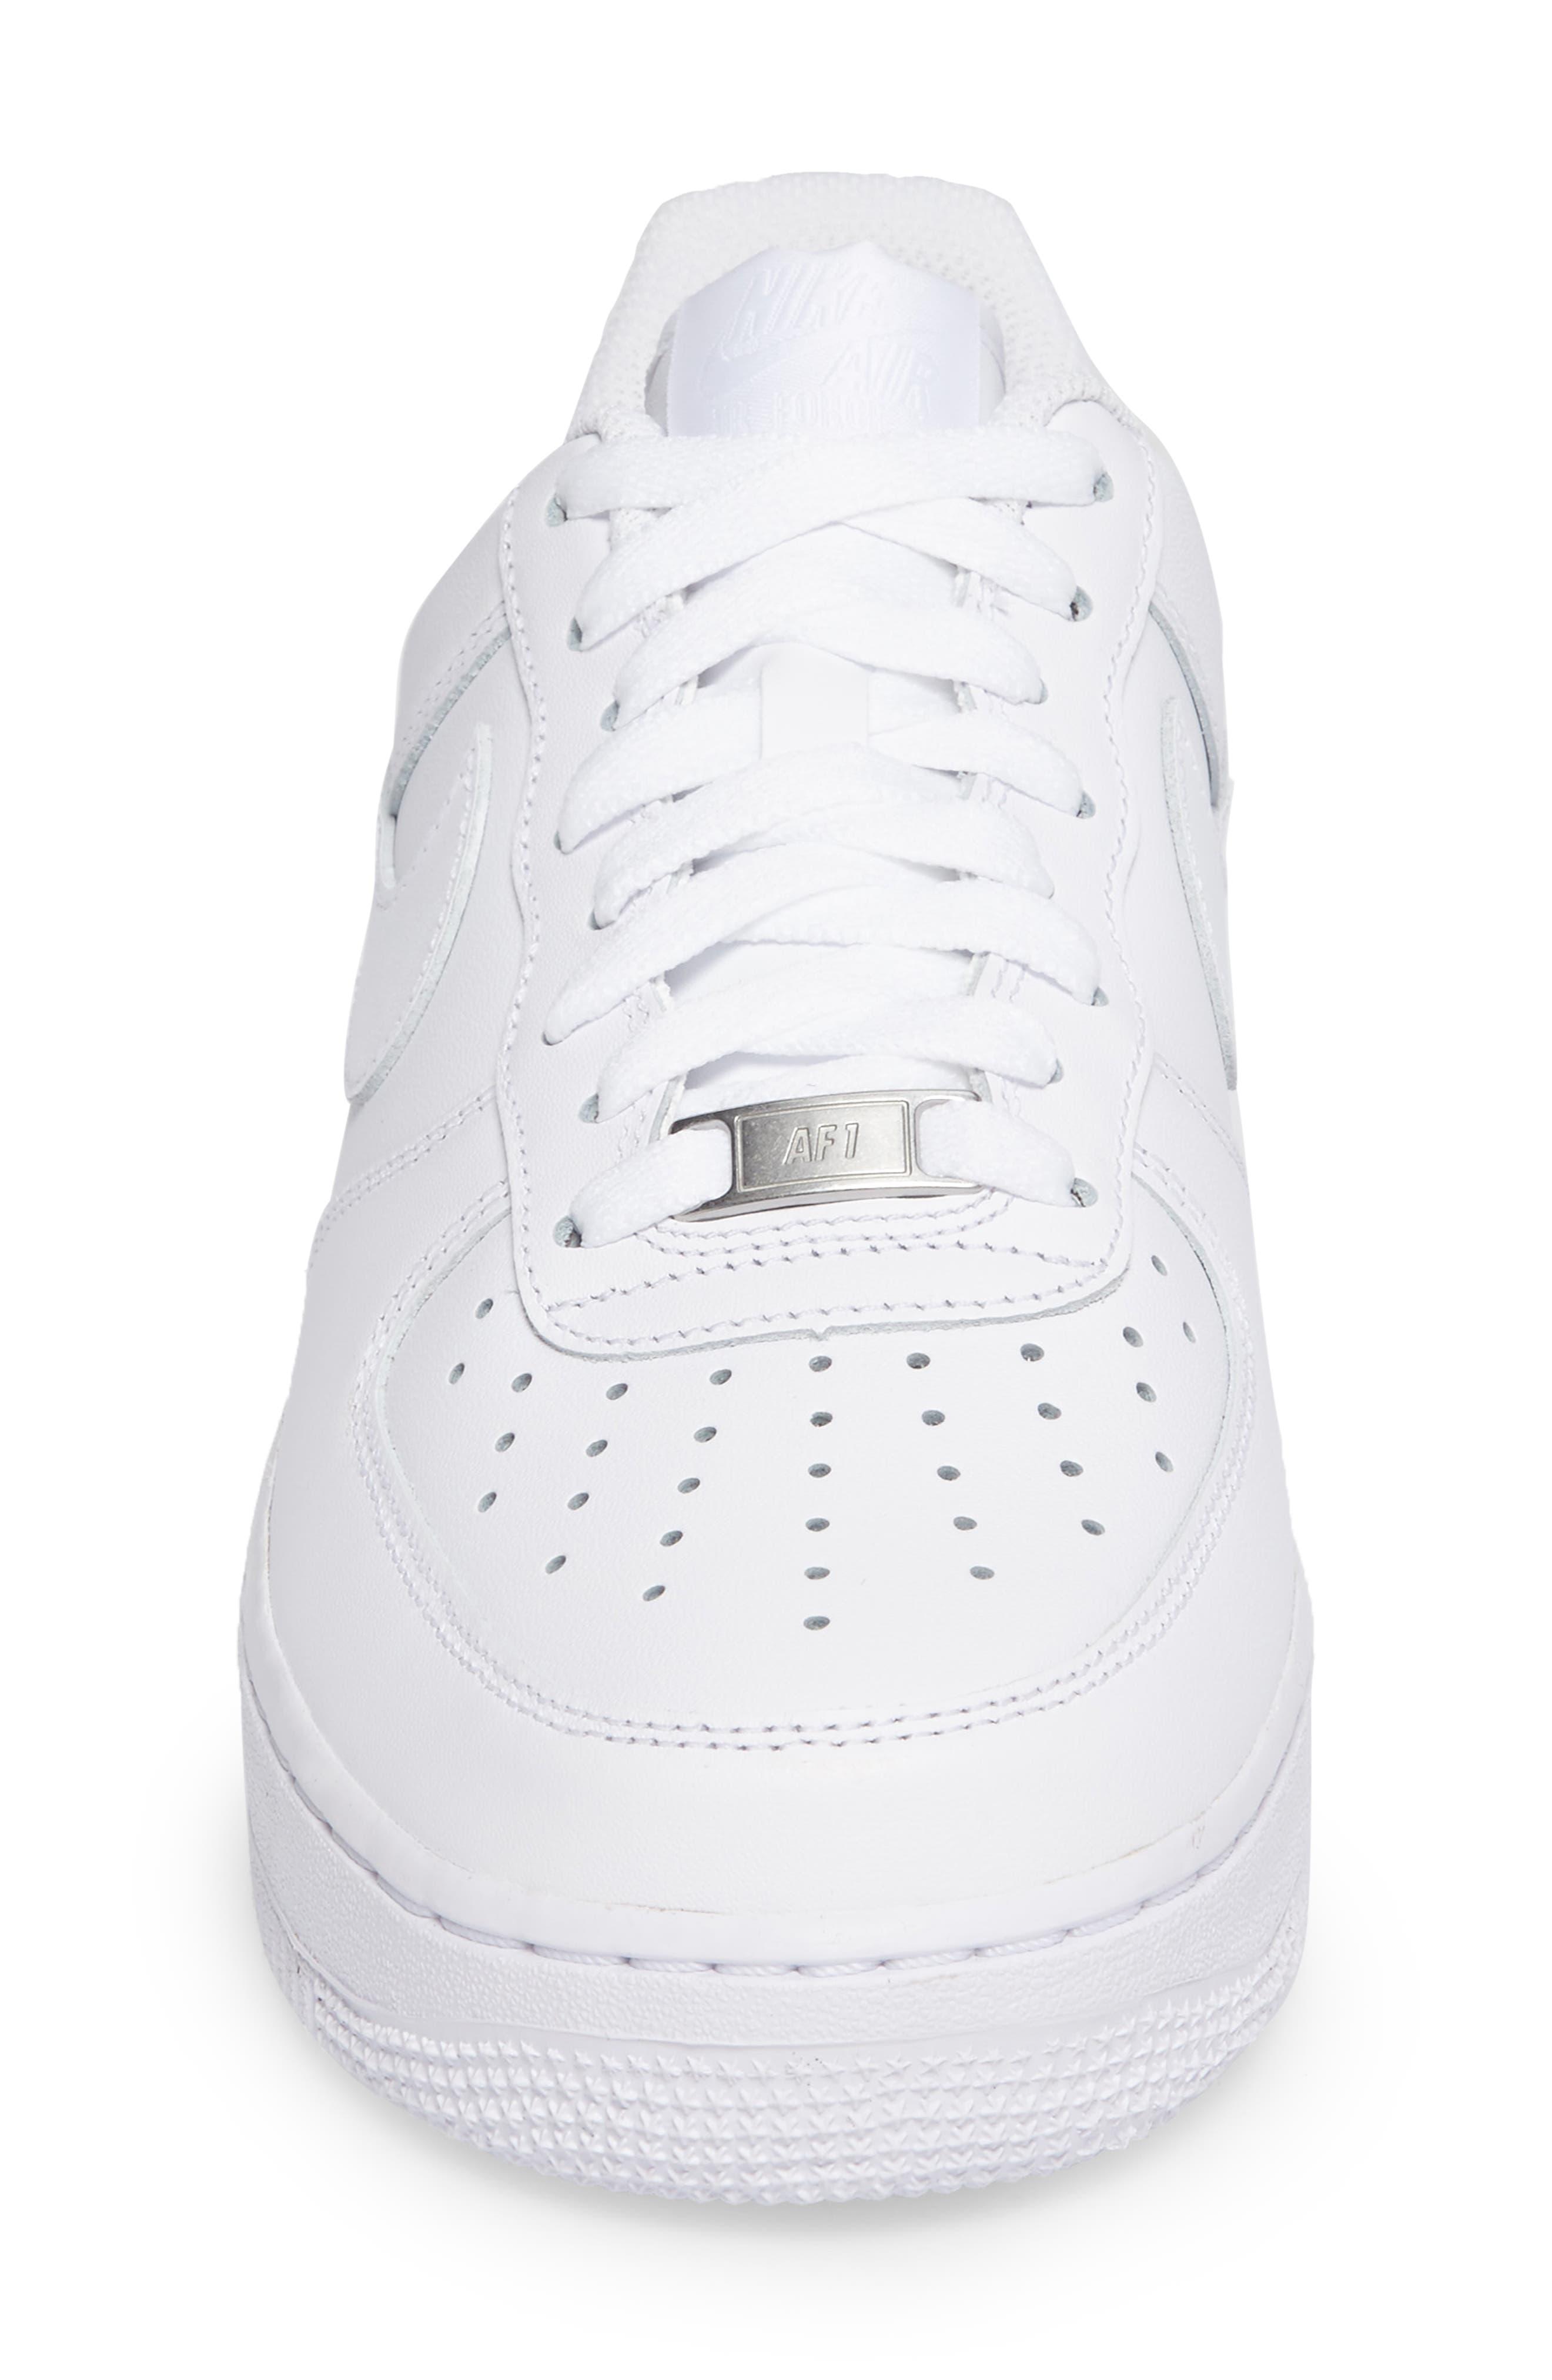 Air Force 1 '07 Sneaker,                             Alternate thumbnail 4, color,                             WHITE/ WHITE